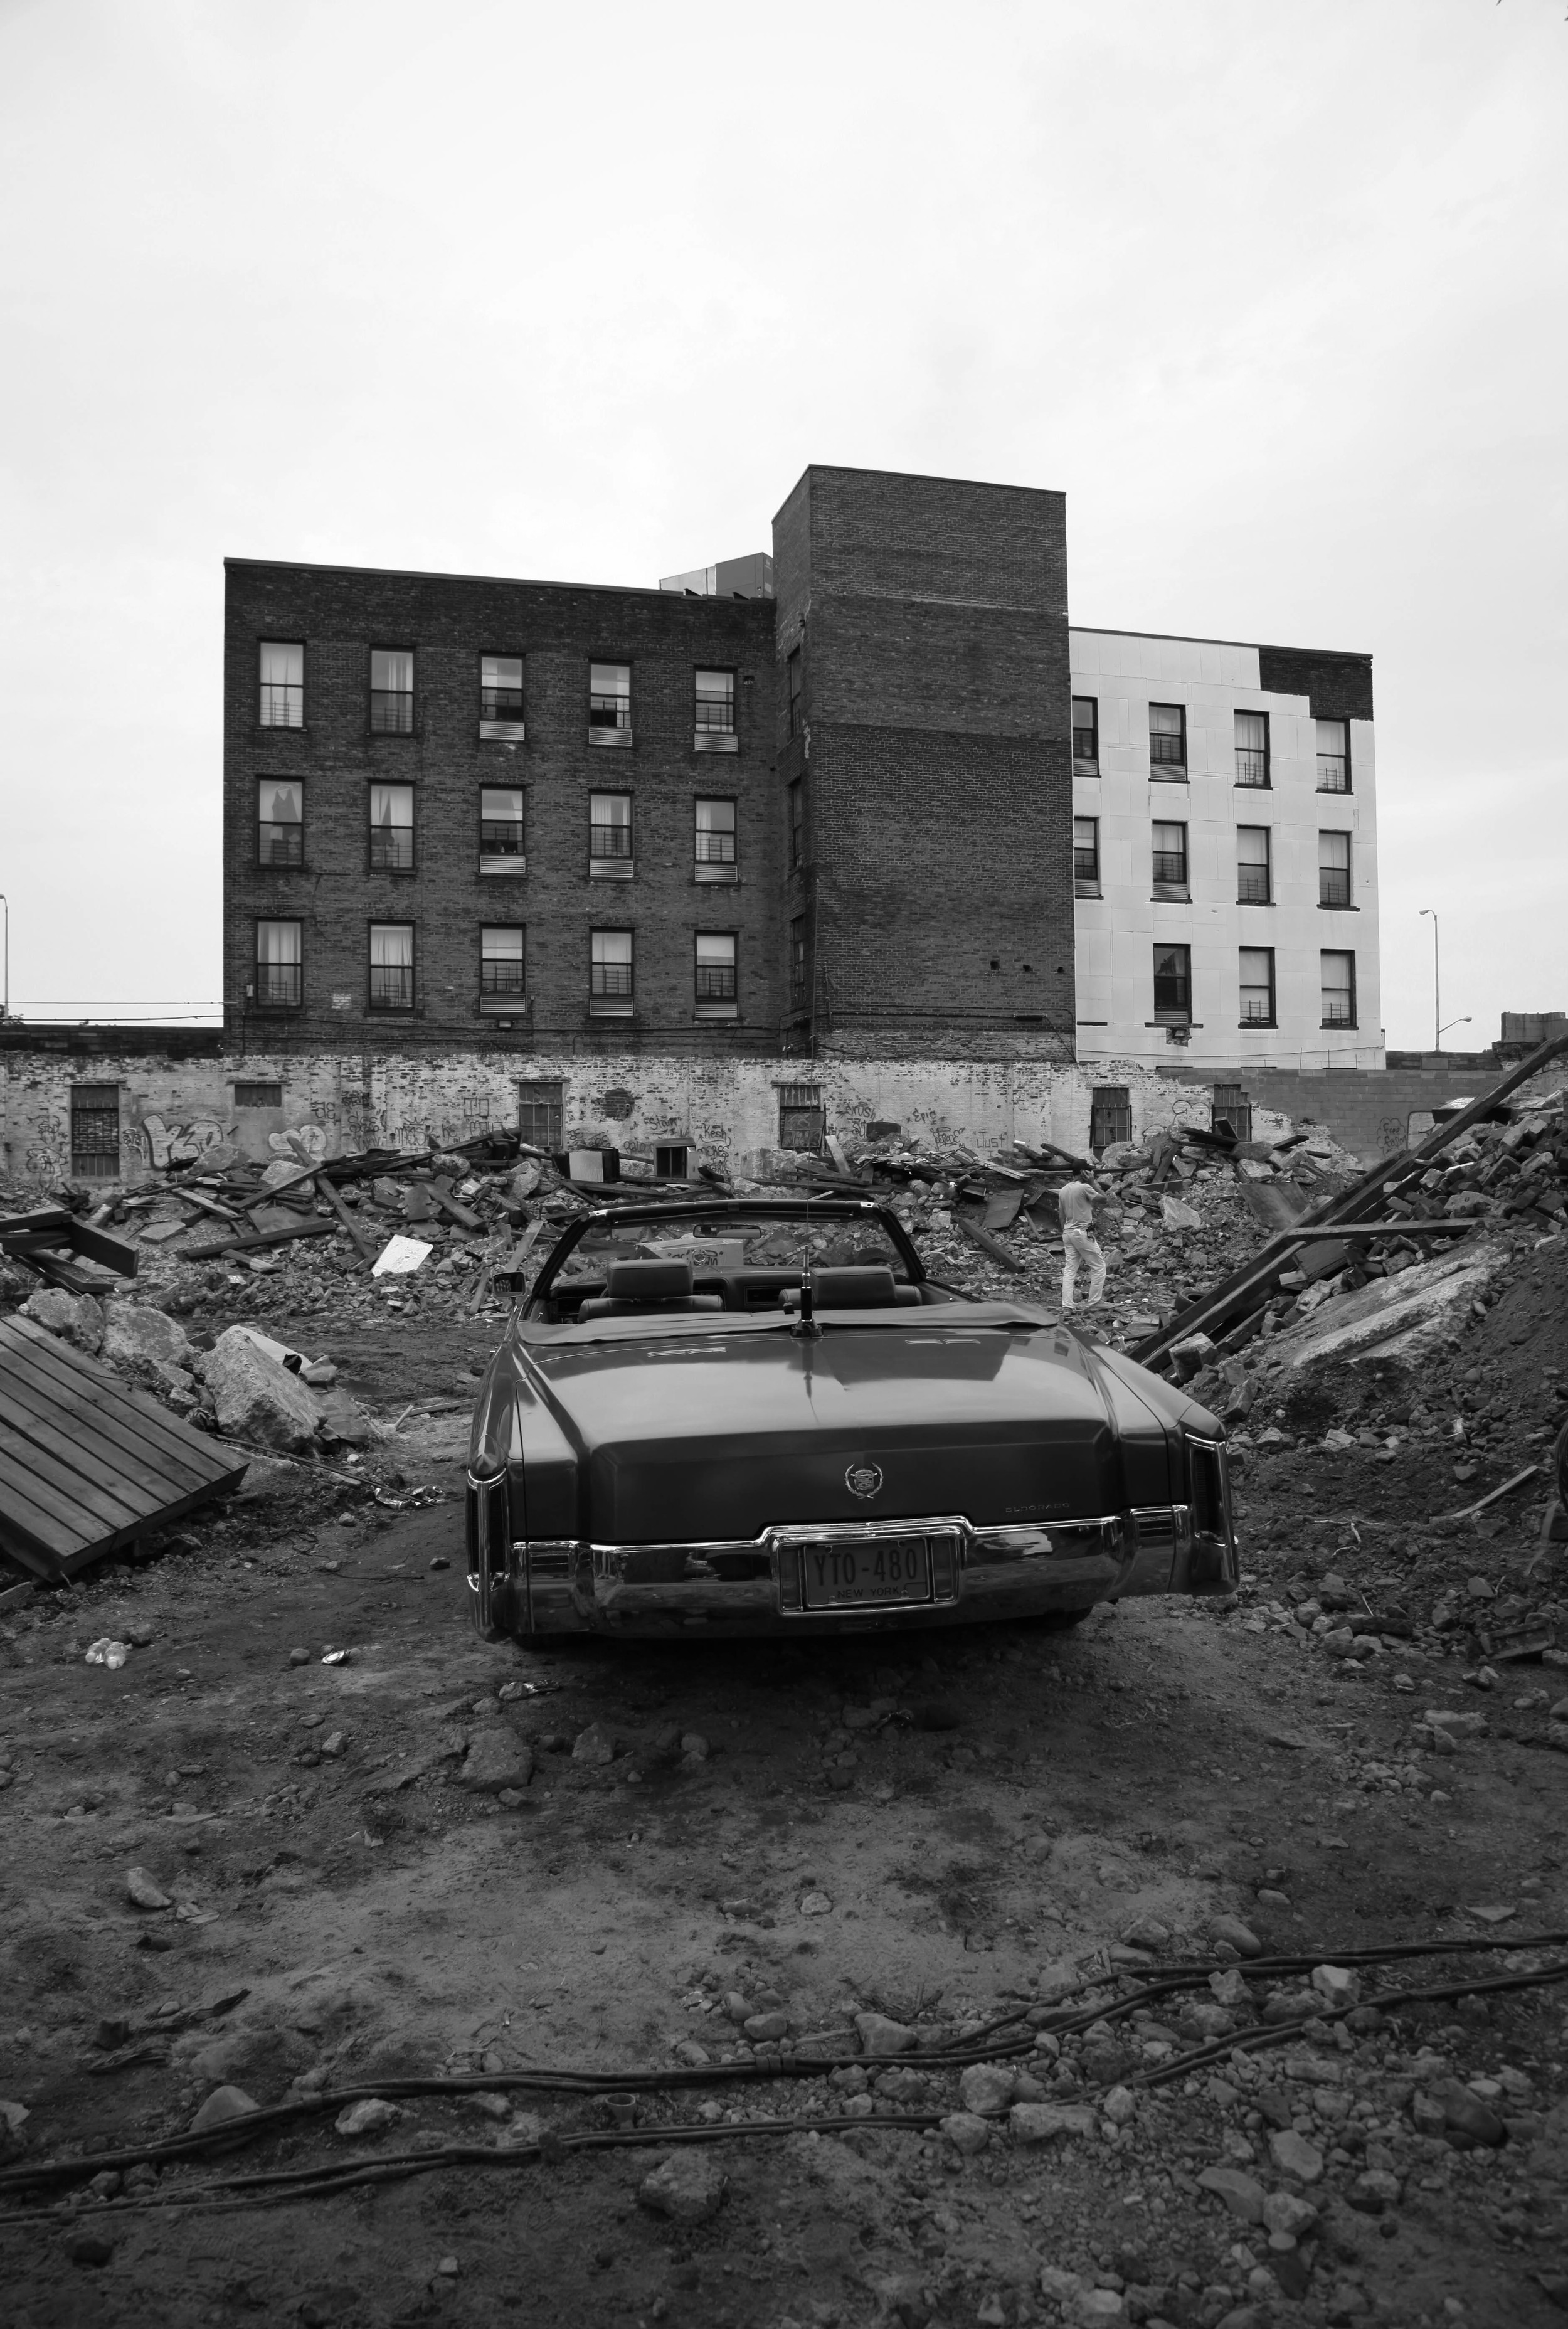 Leica M7, Elmarit-M ,Tri-X 400 35mm  South Bronx, NY  11:00 AM